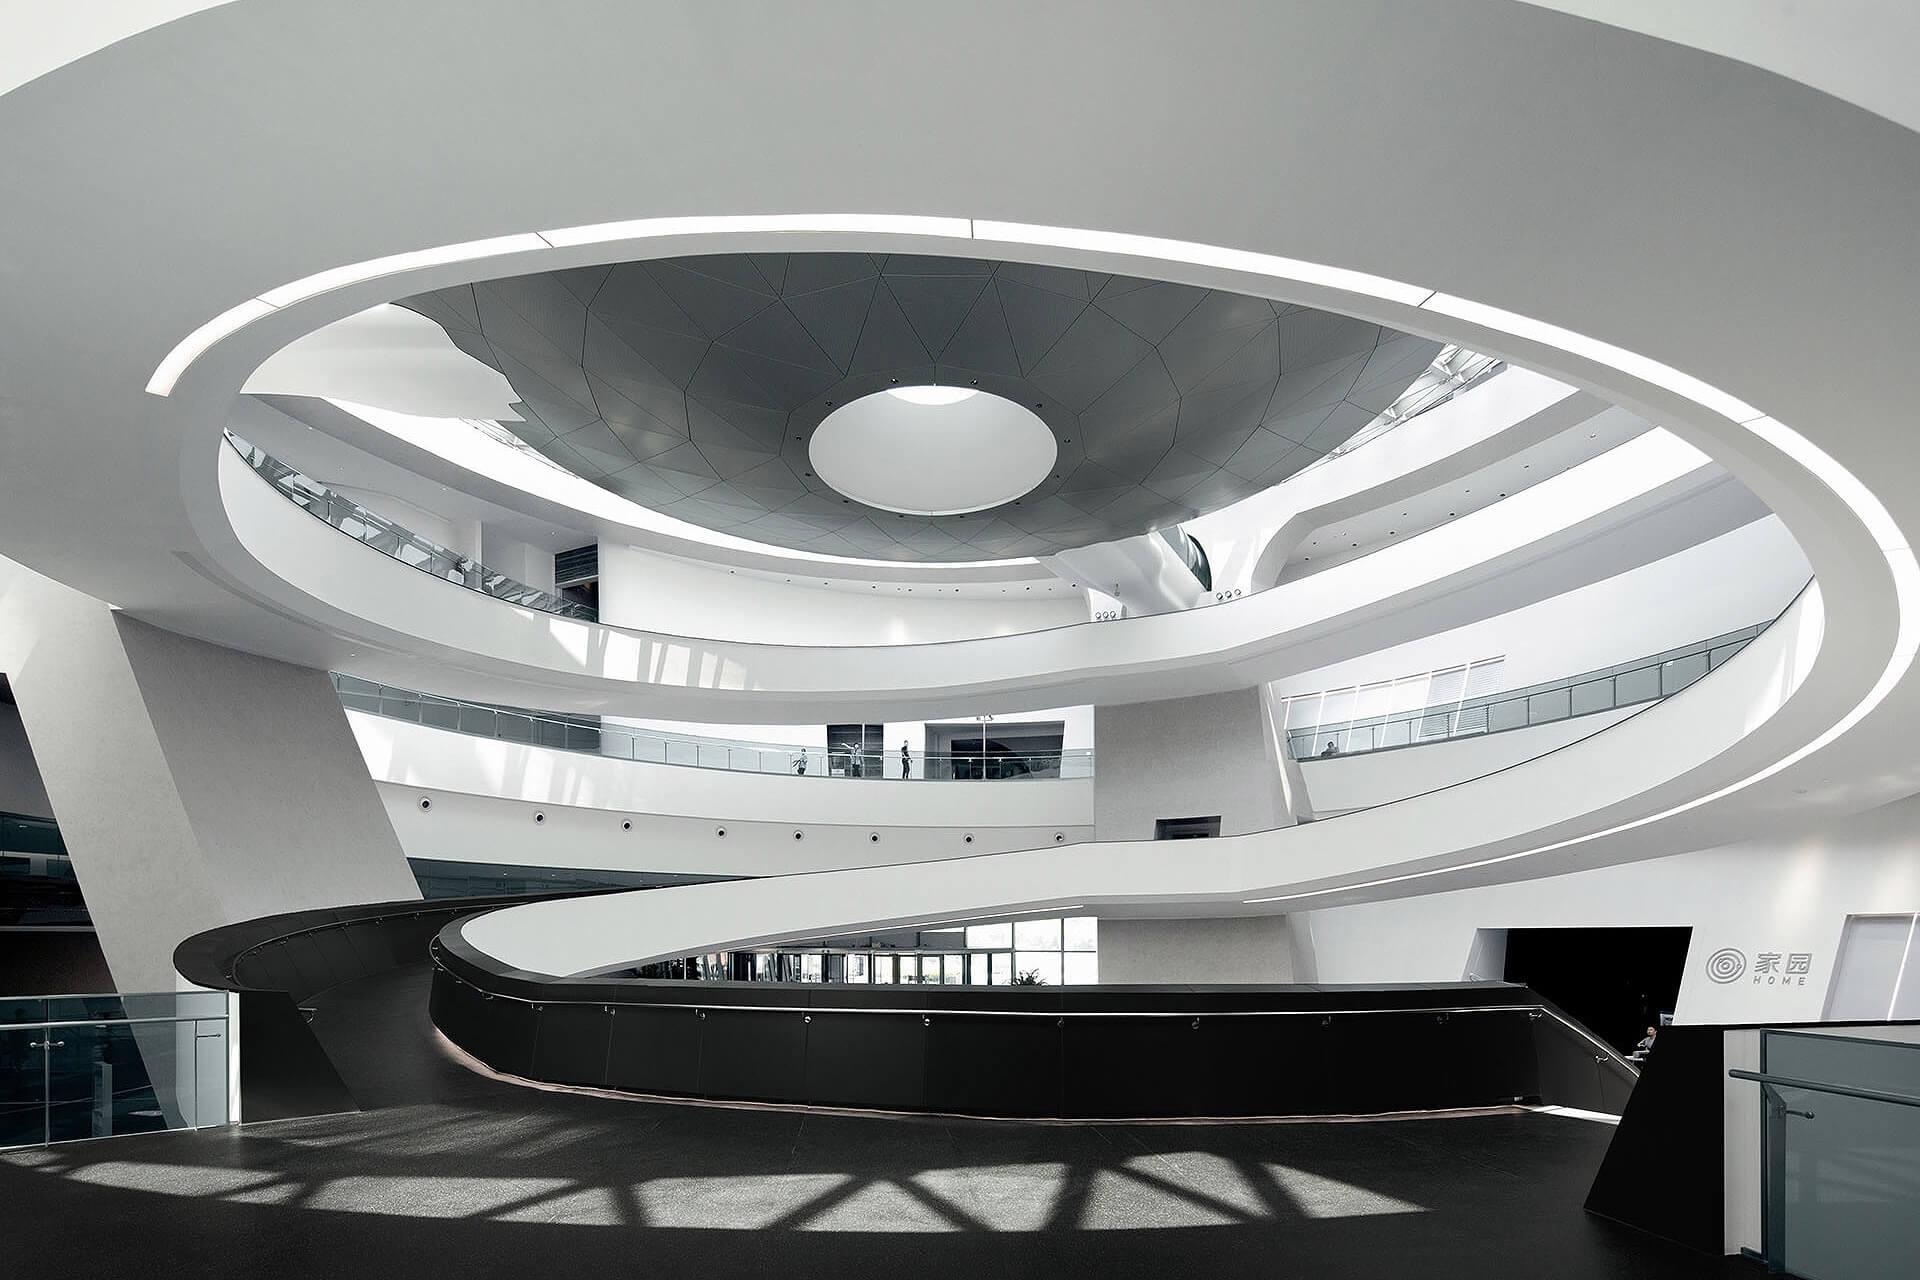 shanghai astronomy museum 4